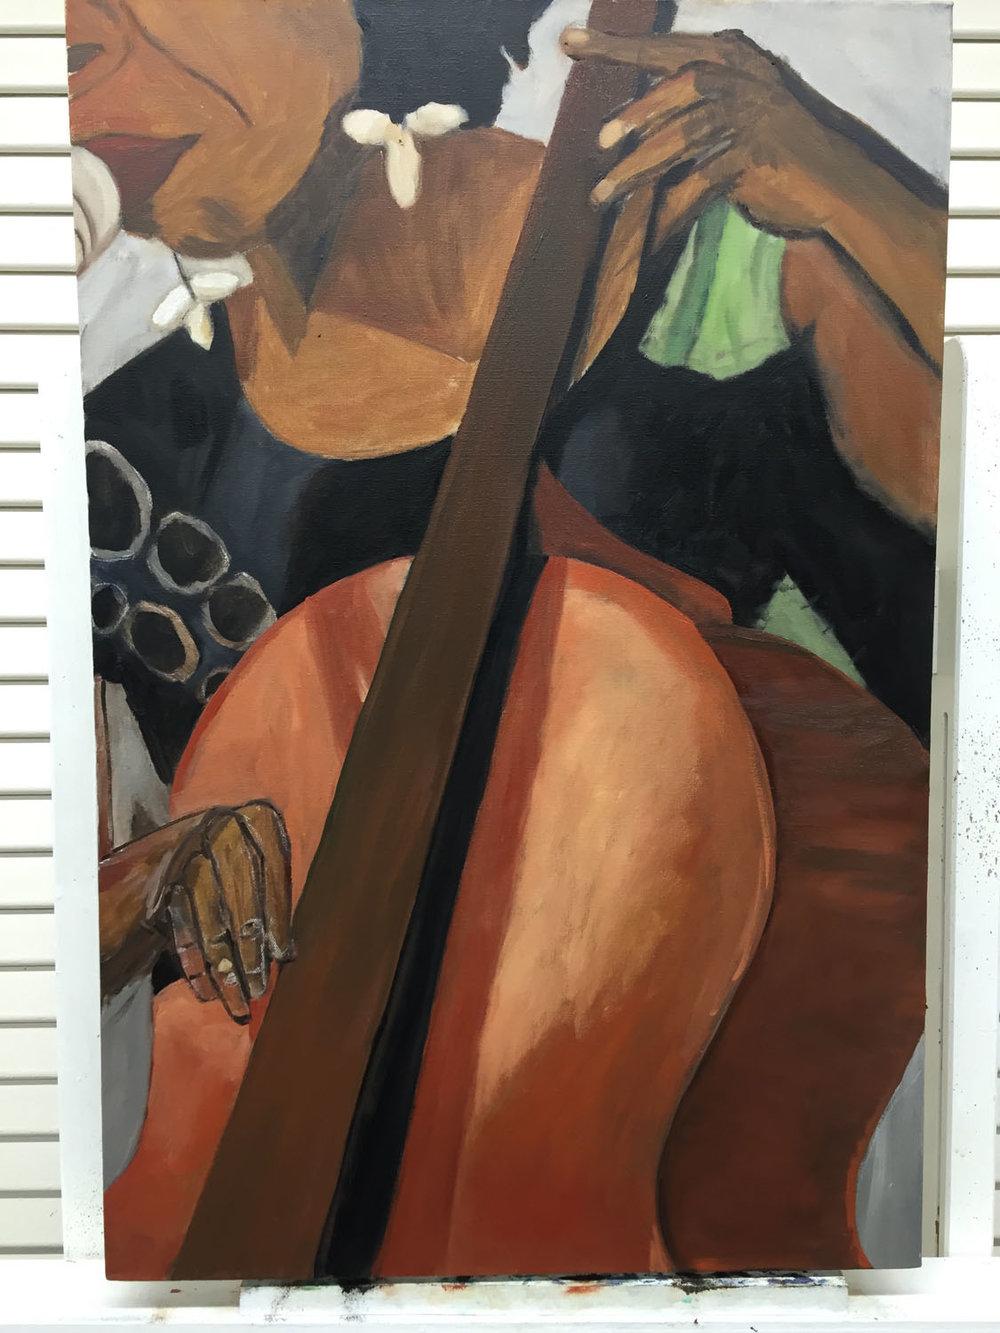 in-process-painting-portrait-of-cellist-musician-singer-shana-tucker-in-concert-by-phyllis-sharpe-artist-IMG_1494.jpg